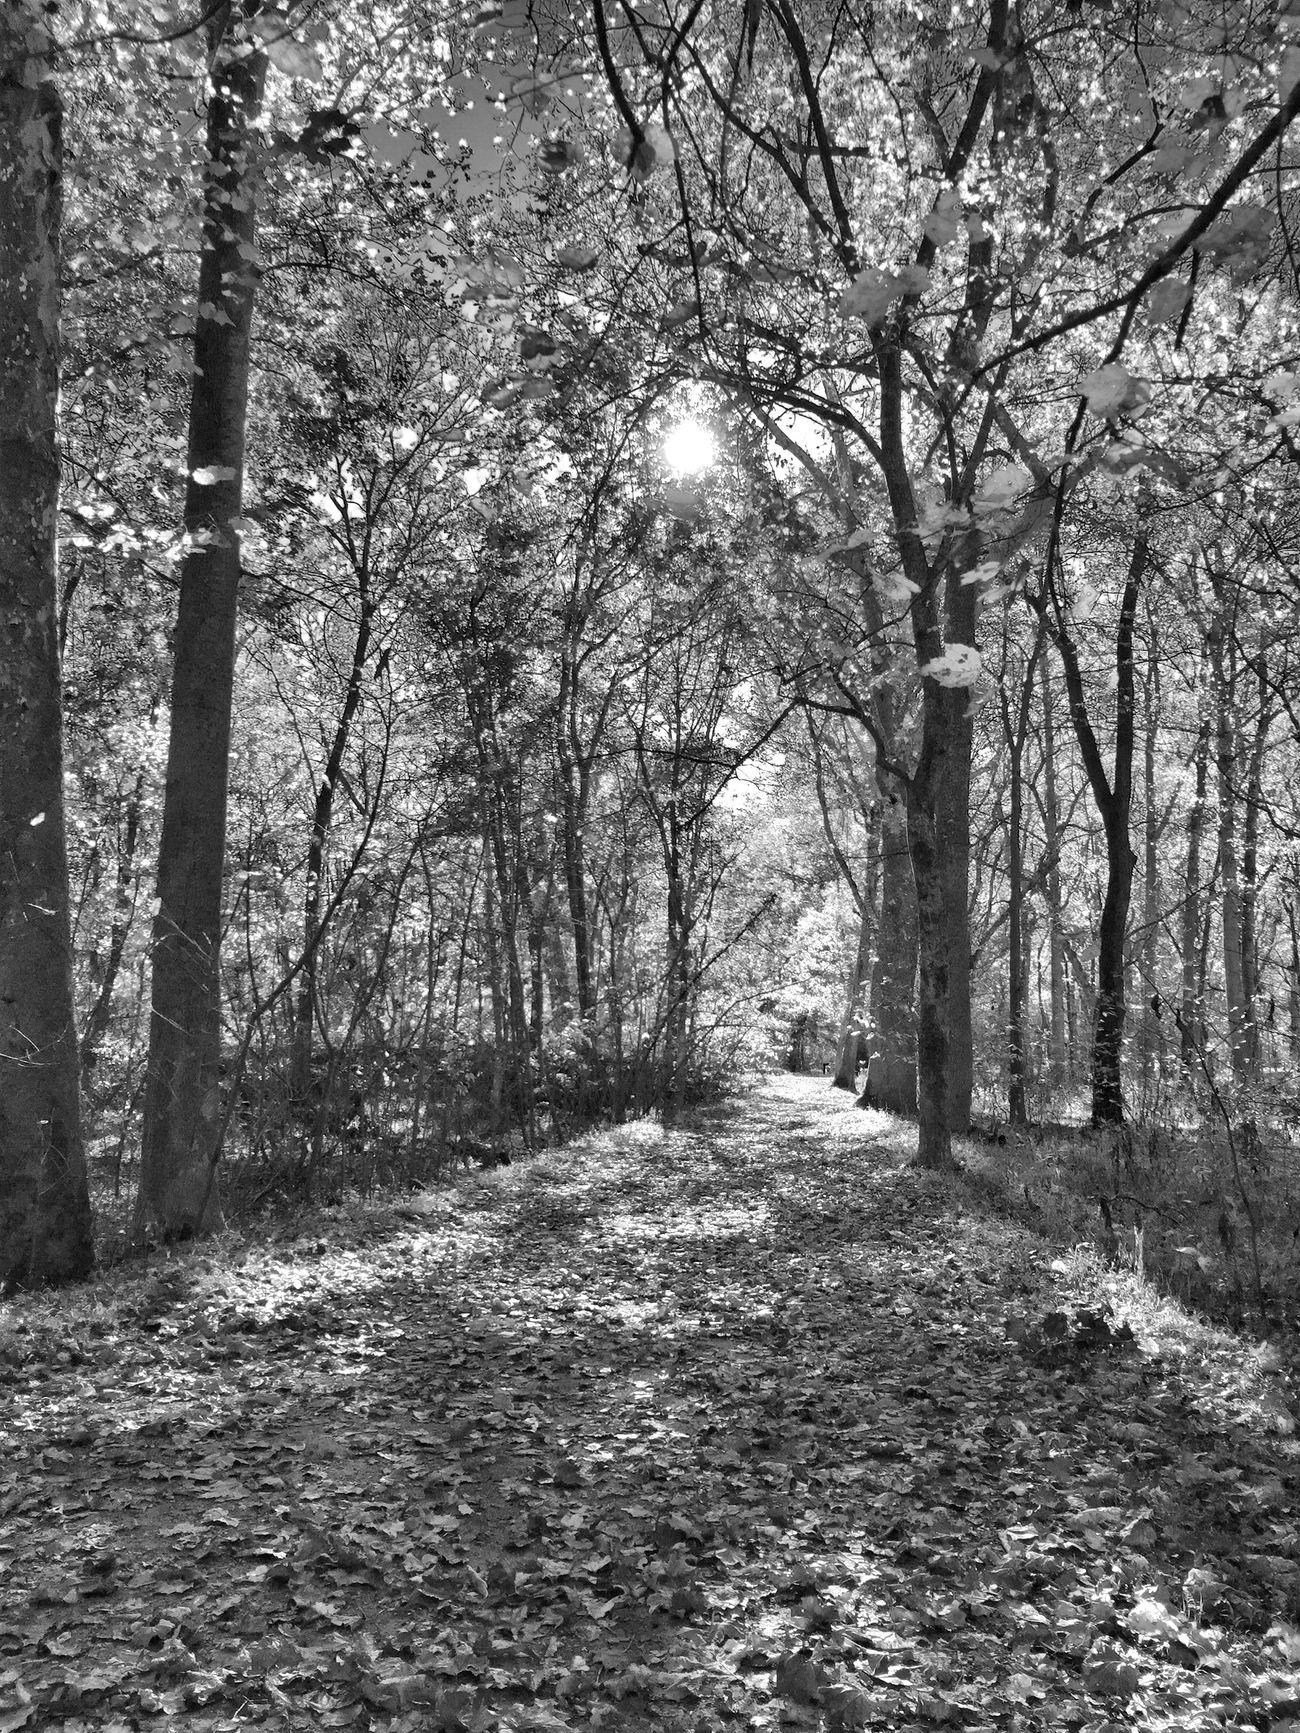 Autumn IPhoneography Sunrise Black And White Monochrome Trees Autumn Leaves Blackandwhite